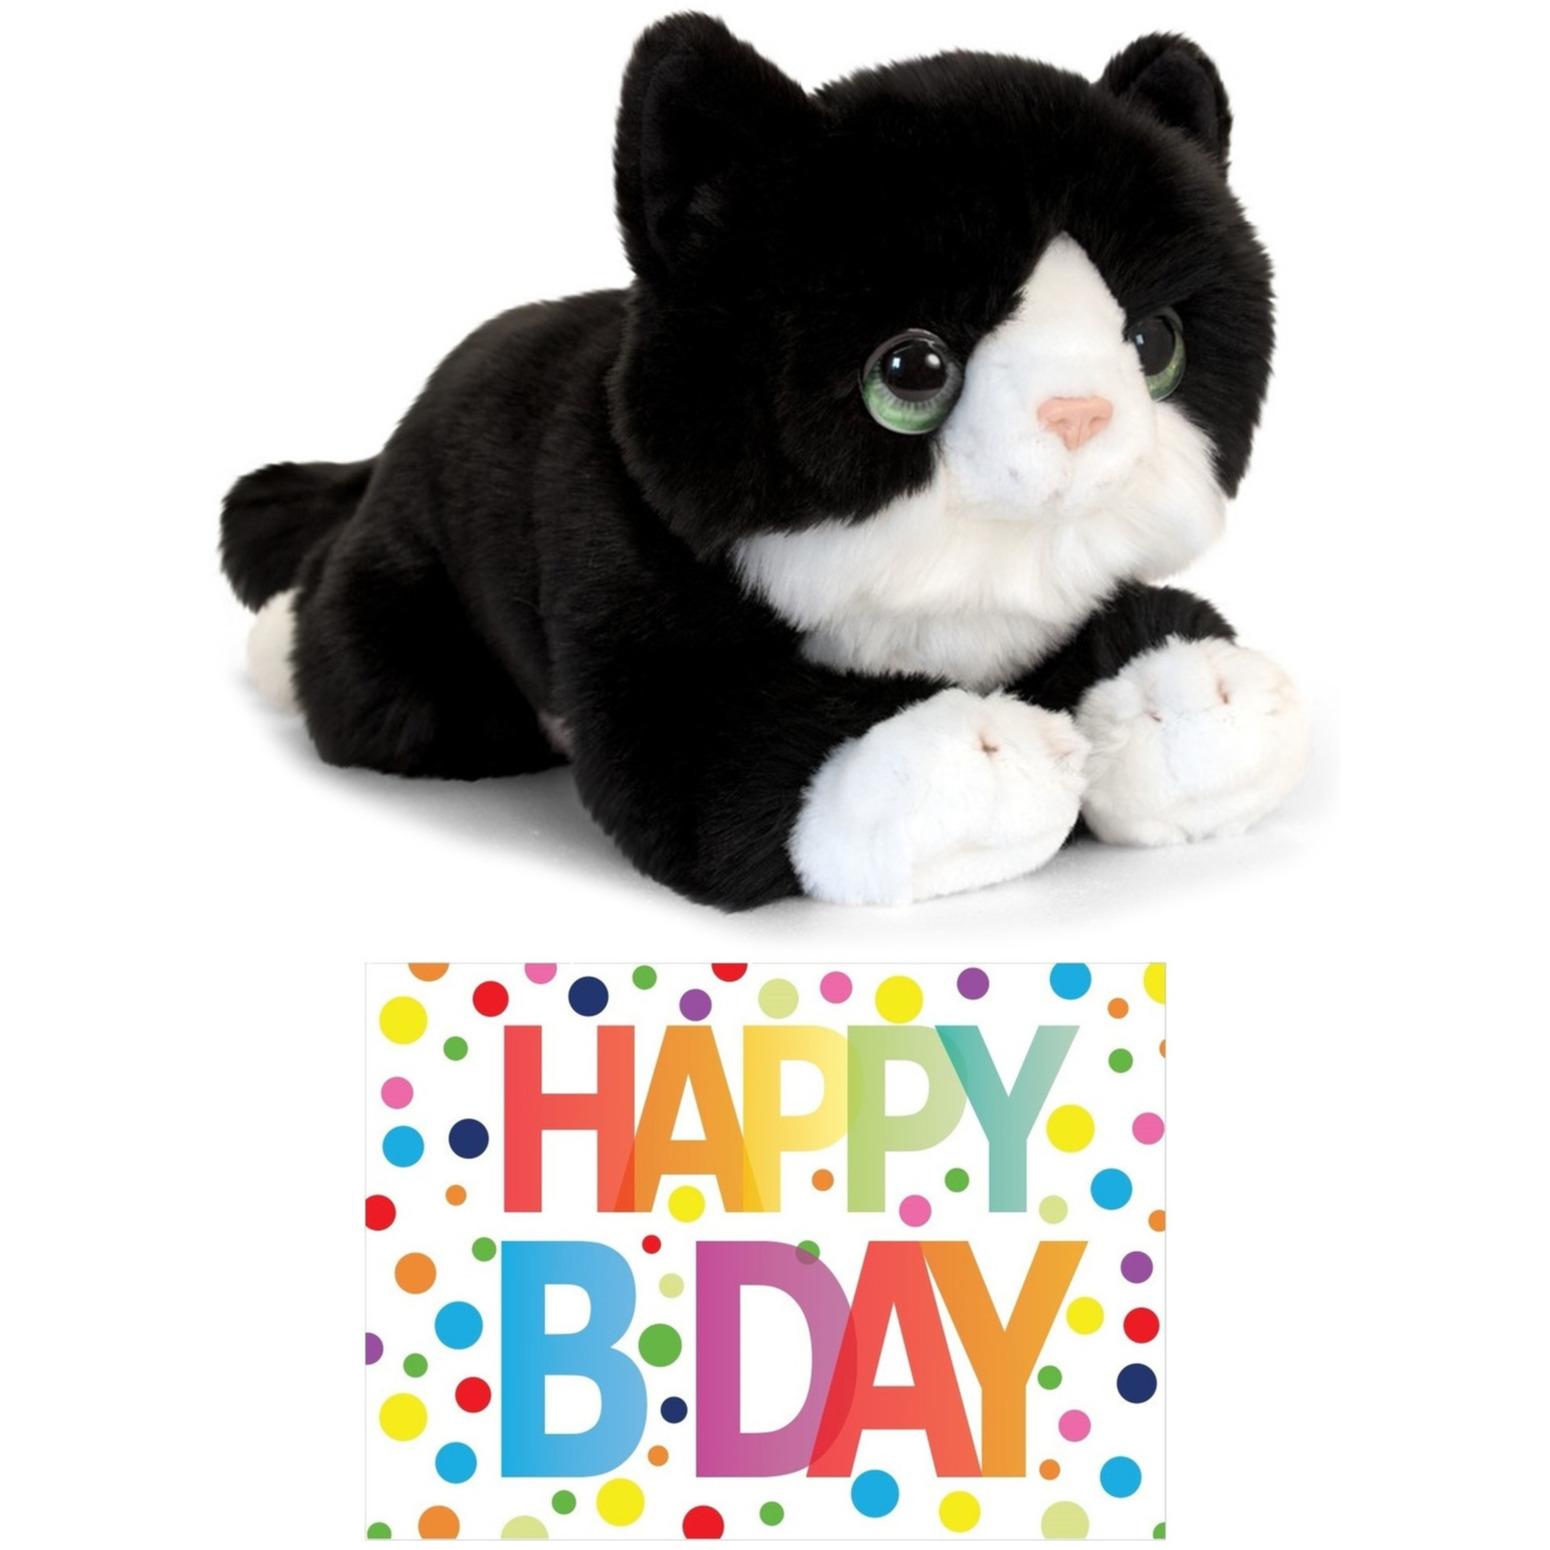 Cadeau setje pluche zwart/witte kat/poes knuffel 32 cm met Happy Birthday wenskaart